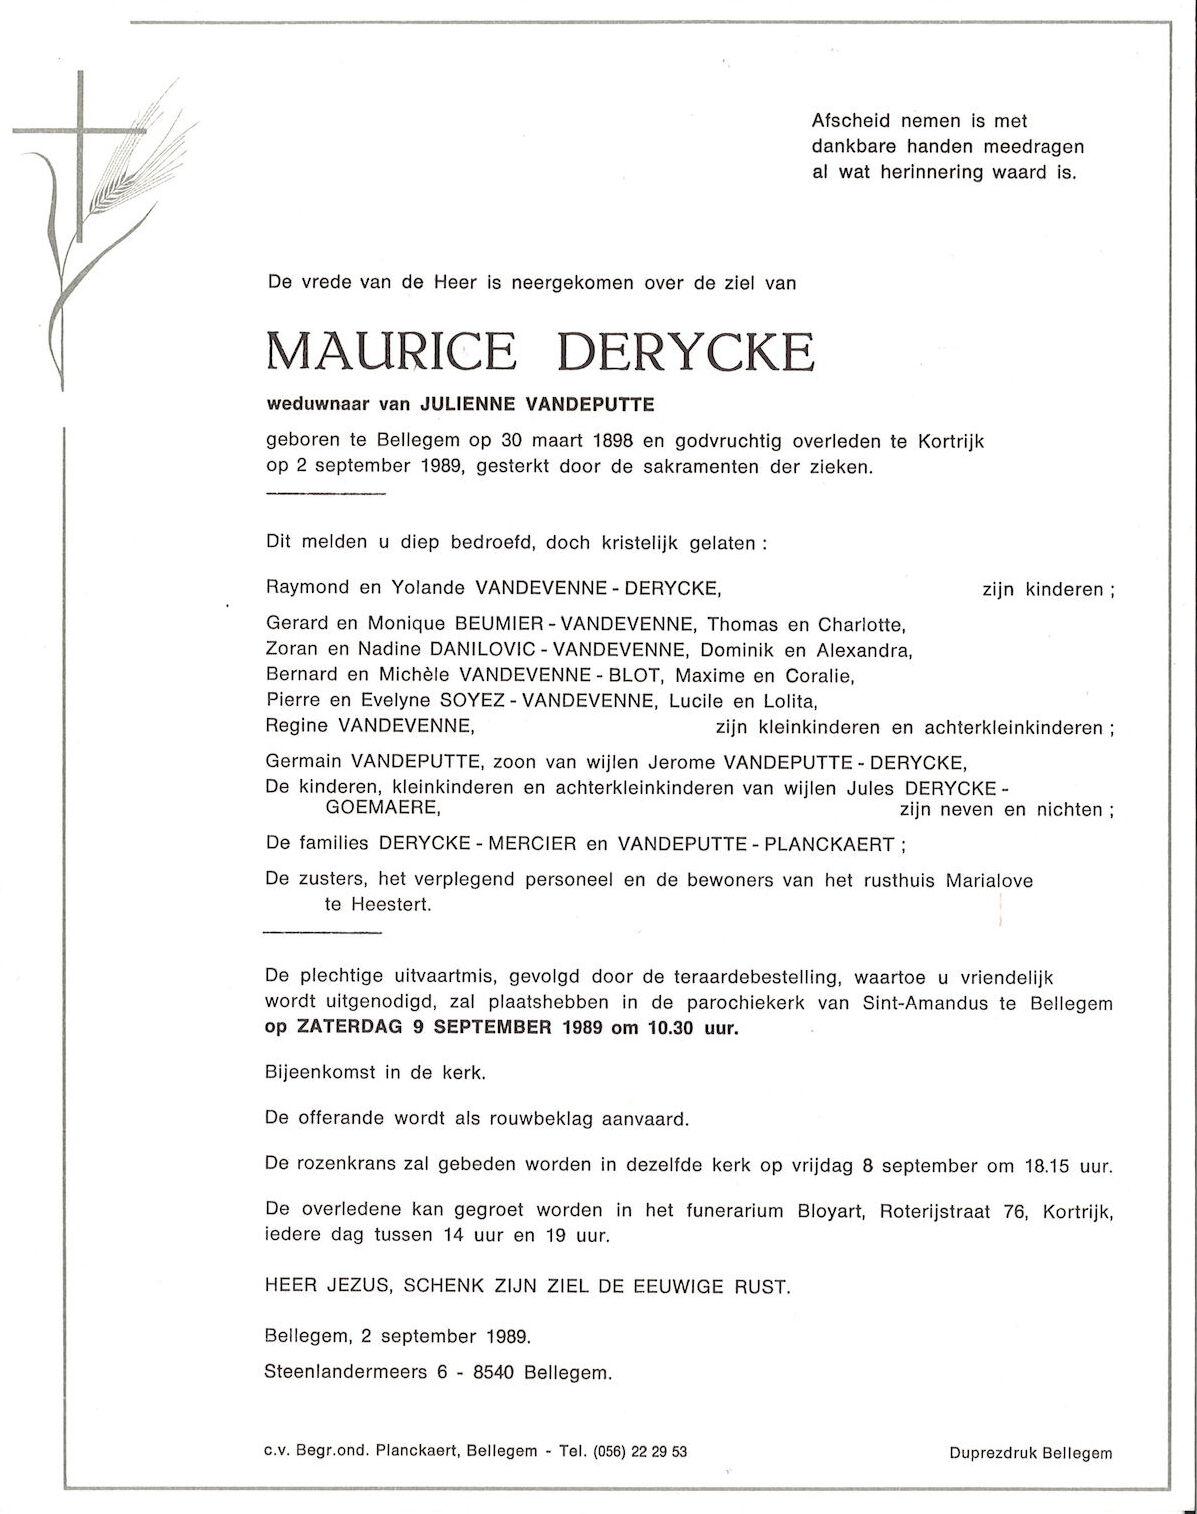 Maurice Derycke